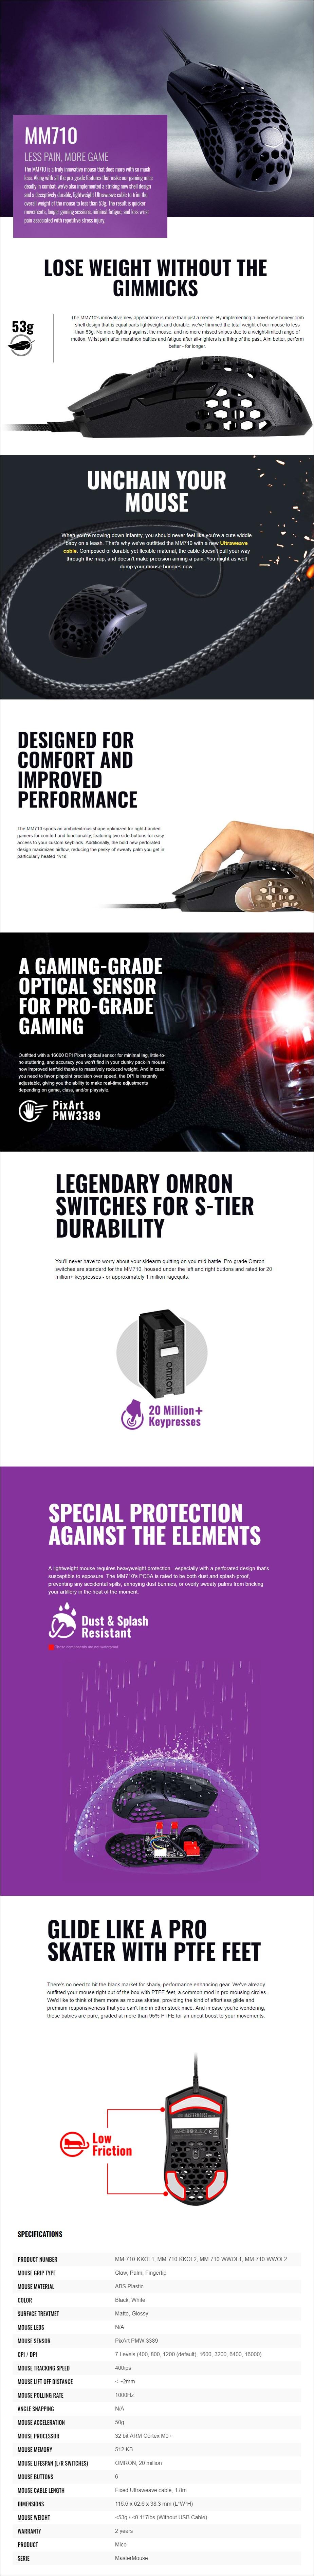 cooler-master-mm710-optical-gaming-mouse-matte-black-ac26140-8-1-.jpg